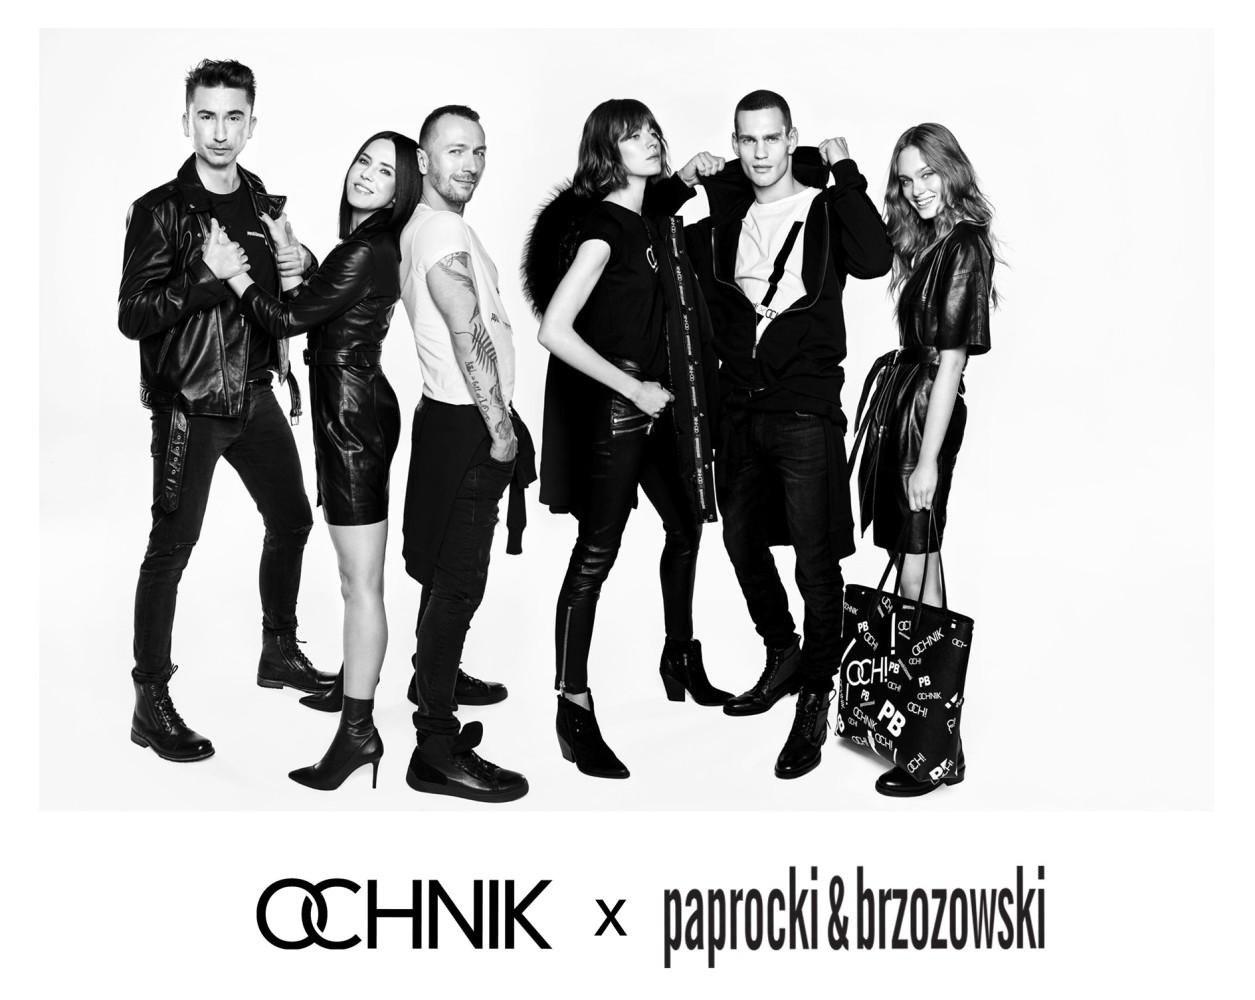 Ivan Zaretski for Paprocki&Brzozowski x OCHNIK FW 2019 Campaign